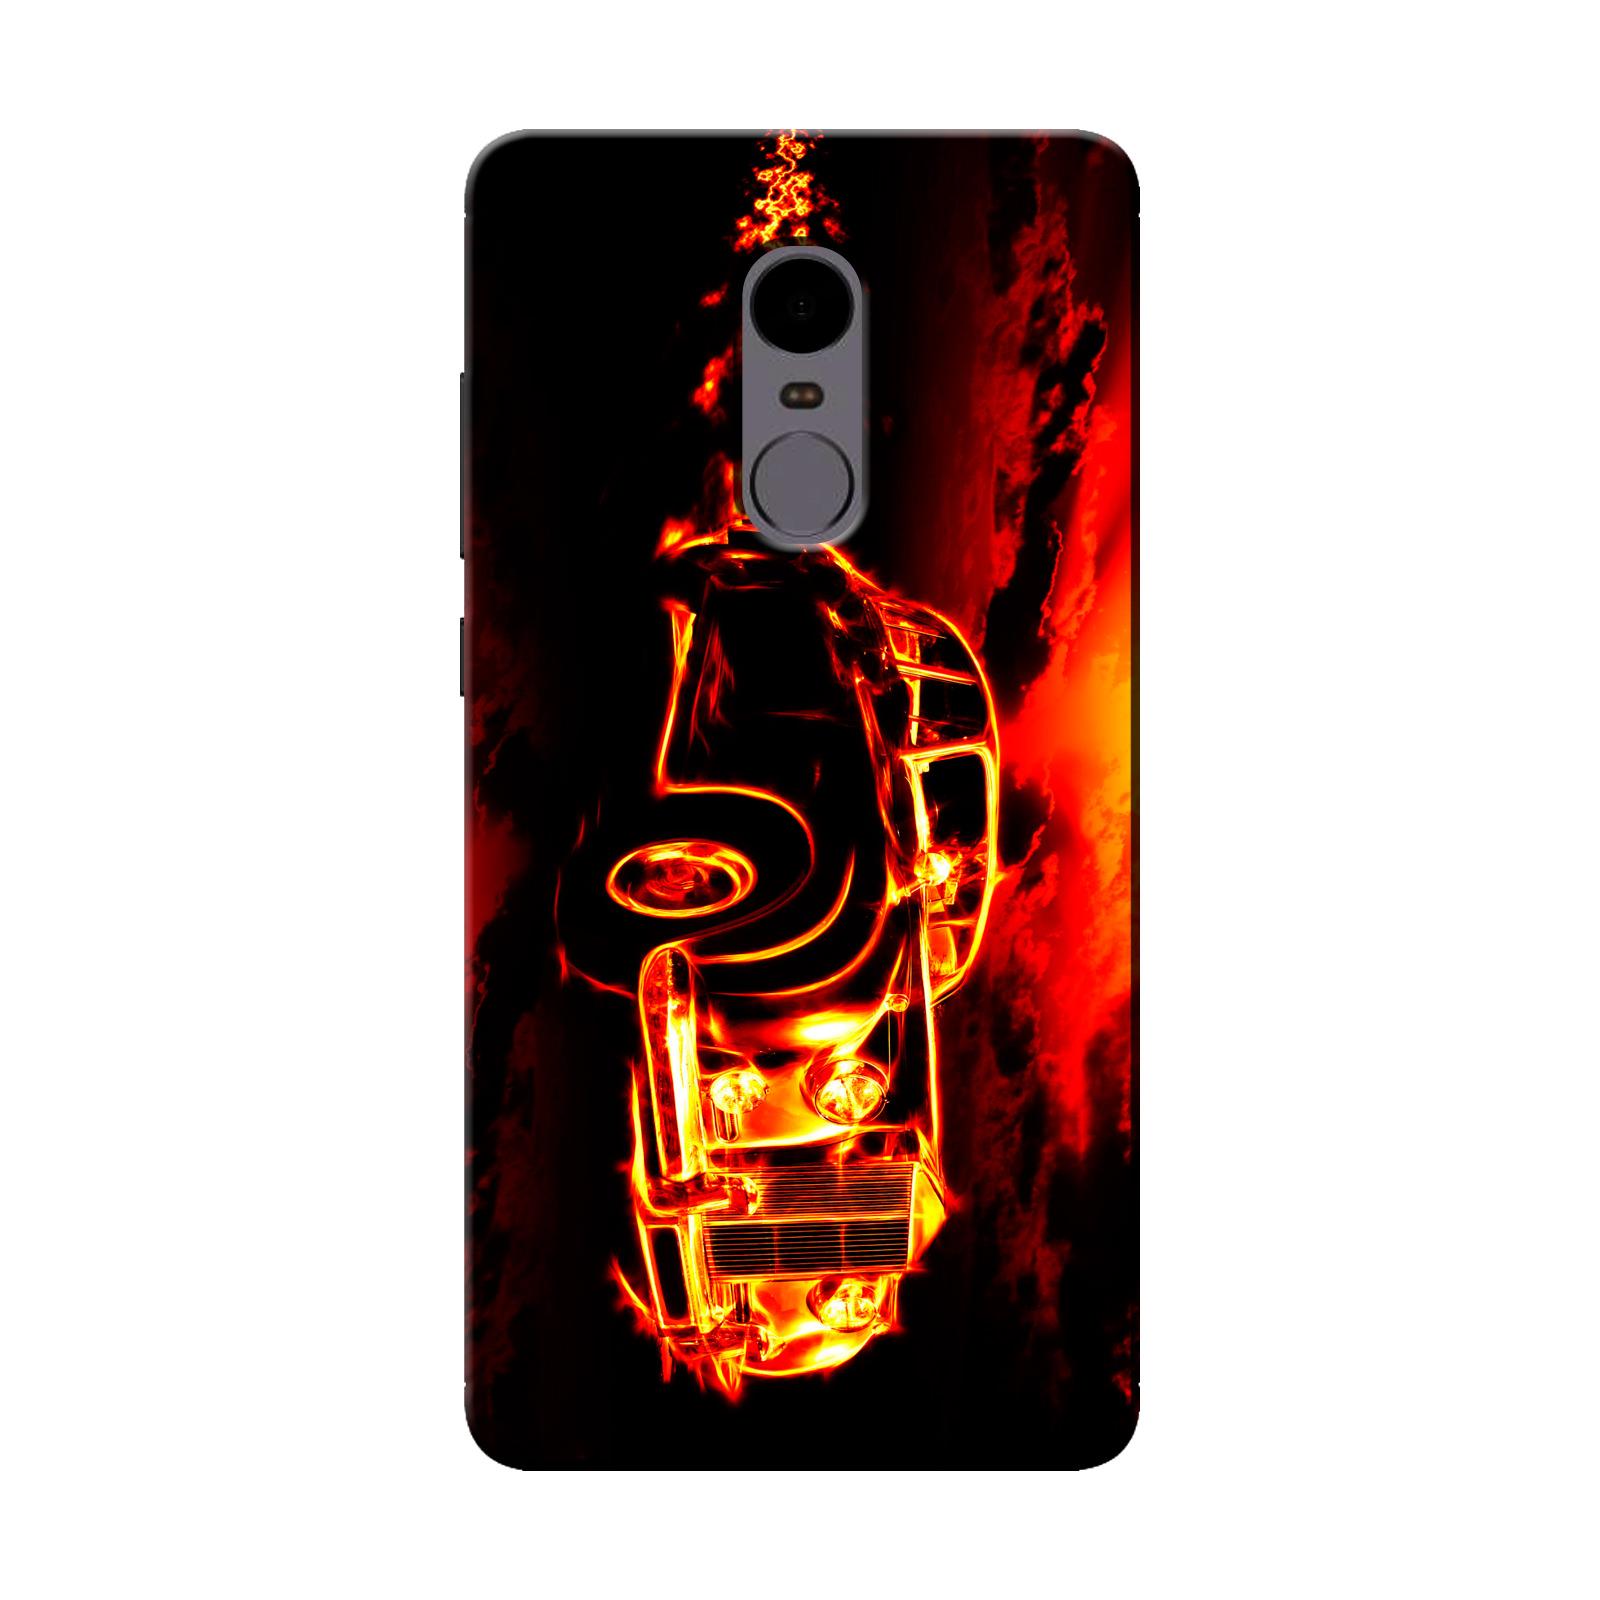 sairafashions Wild Thunder Mi Redmi Note 4 Mobile Back Cover Case And Designer Printed Hard Flexible Mobile Case Cover  - 1136